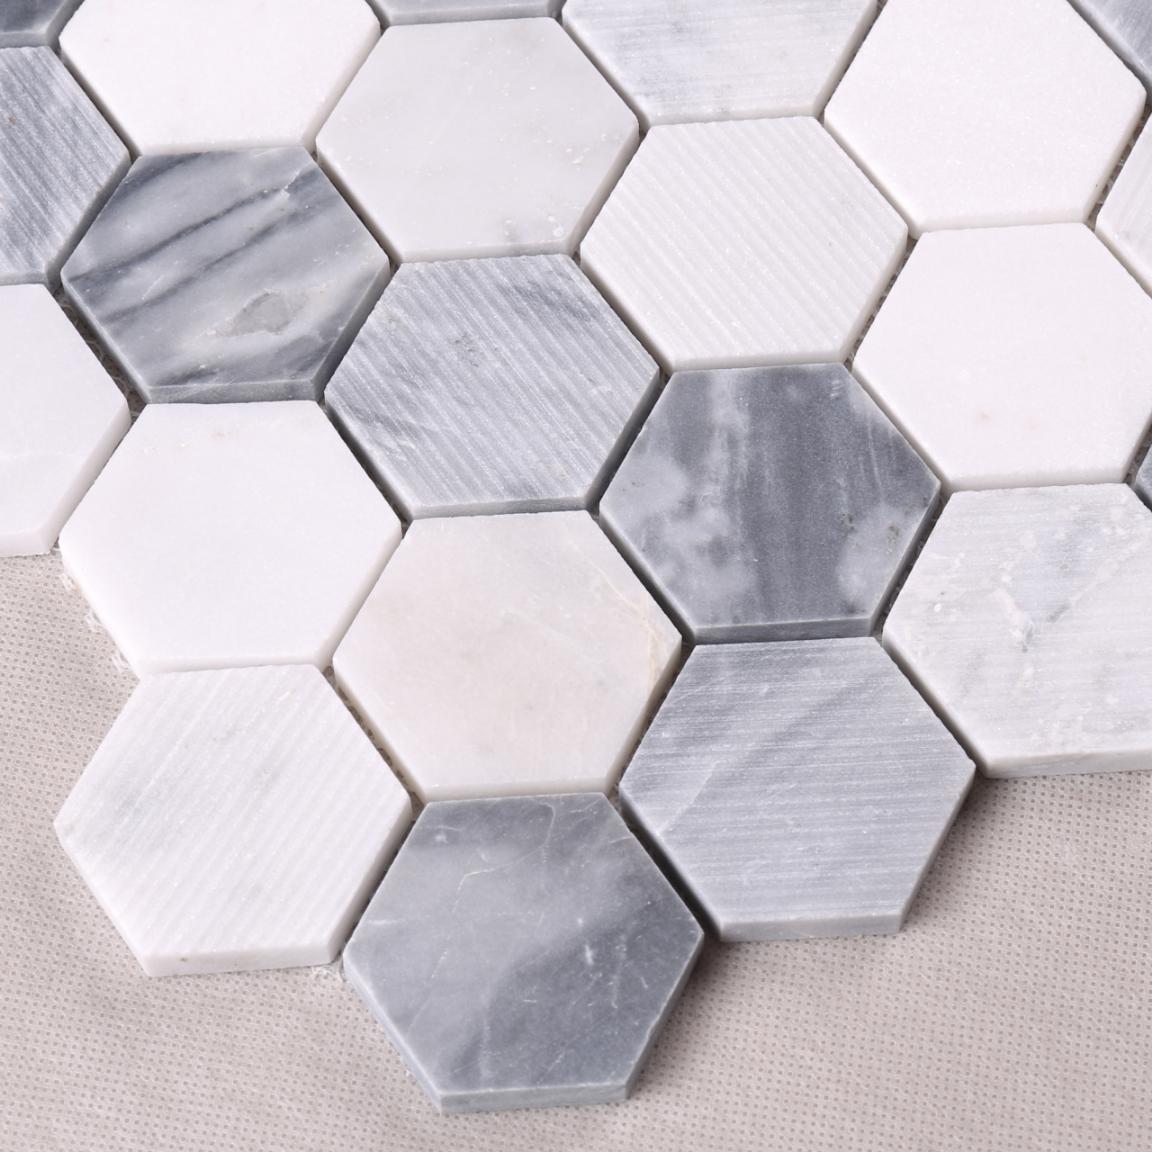 HSC134 Carrara White Hexagon Marble Backsplash Mosaic Tiles